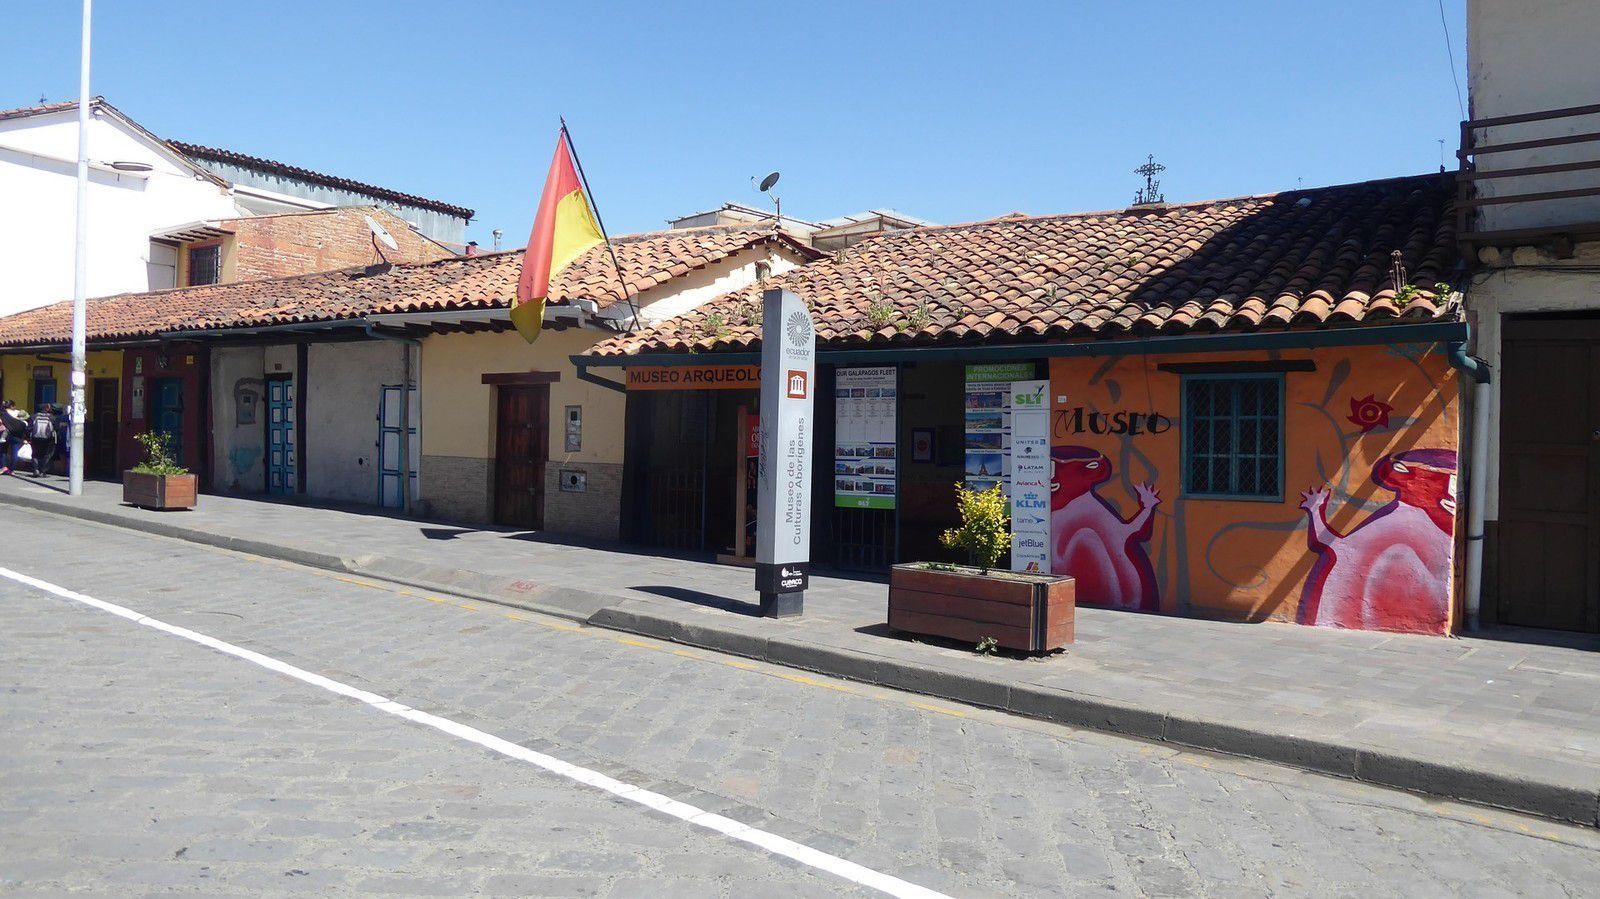 J20 - Mardi 7 Janvier 2020 - Cuenca